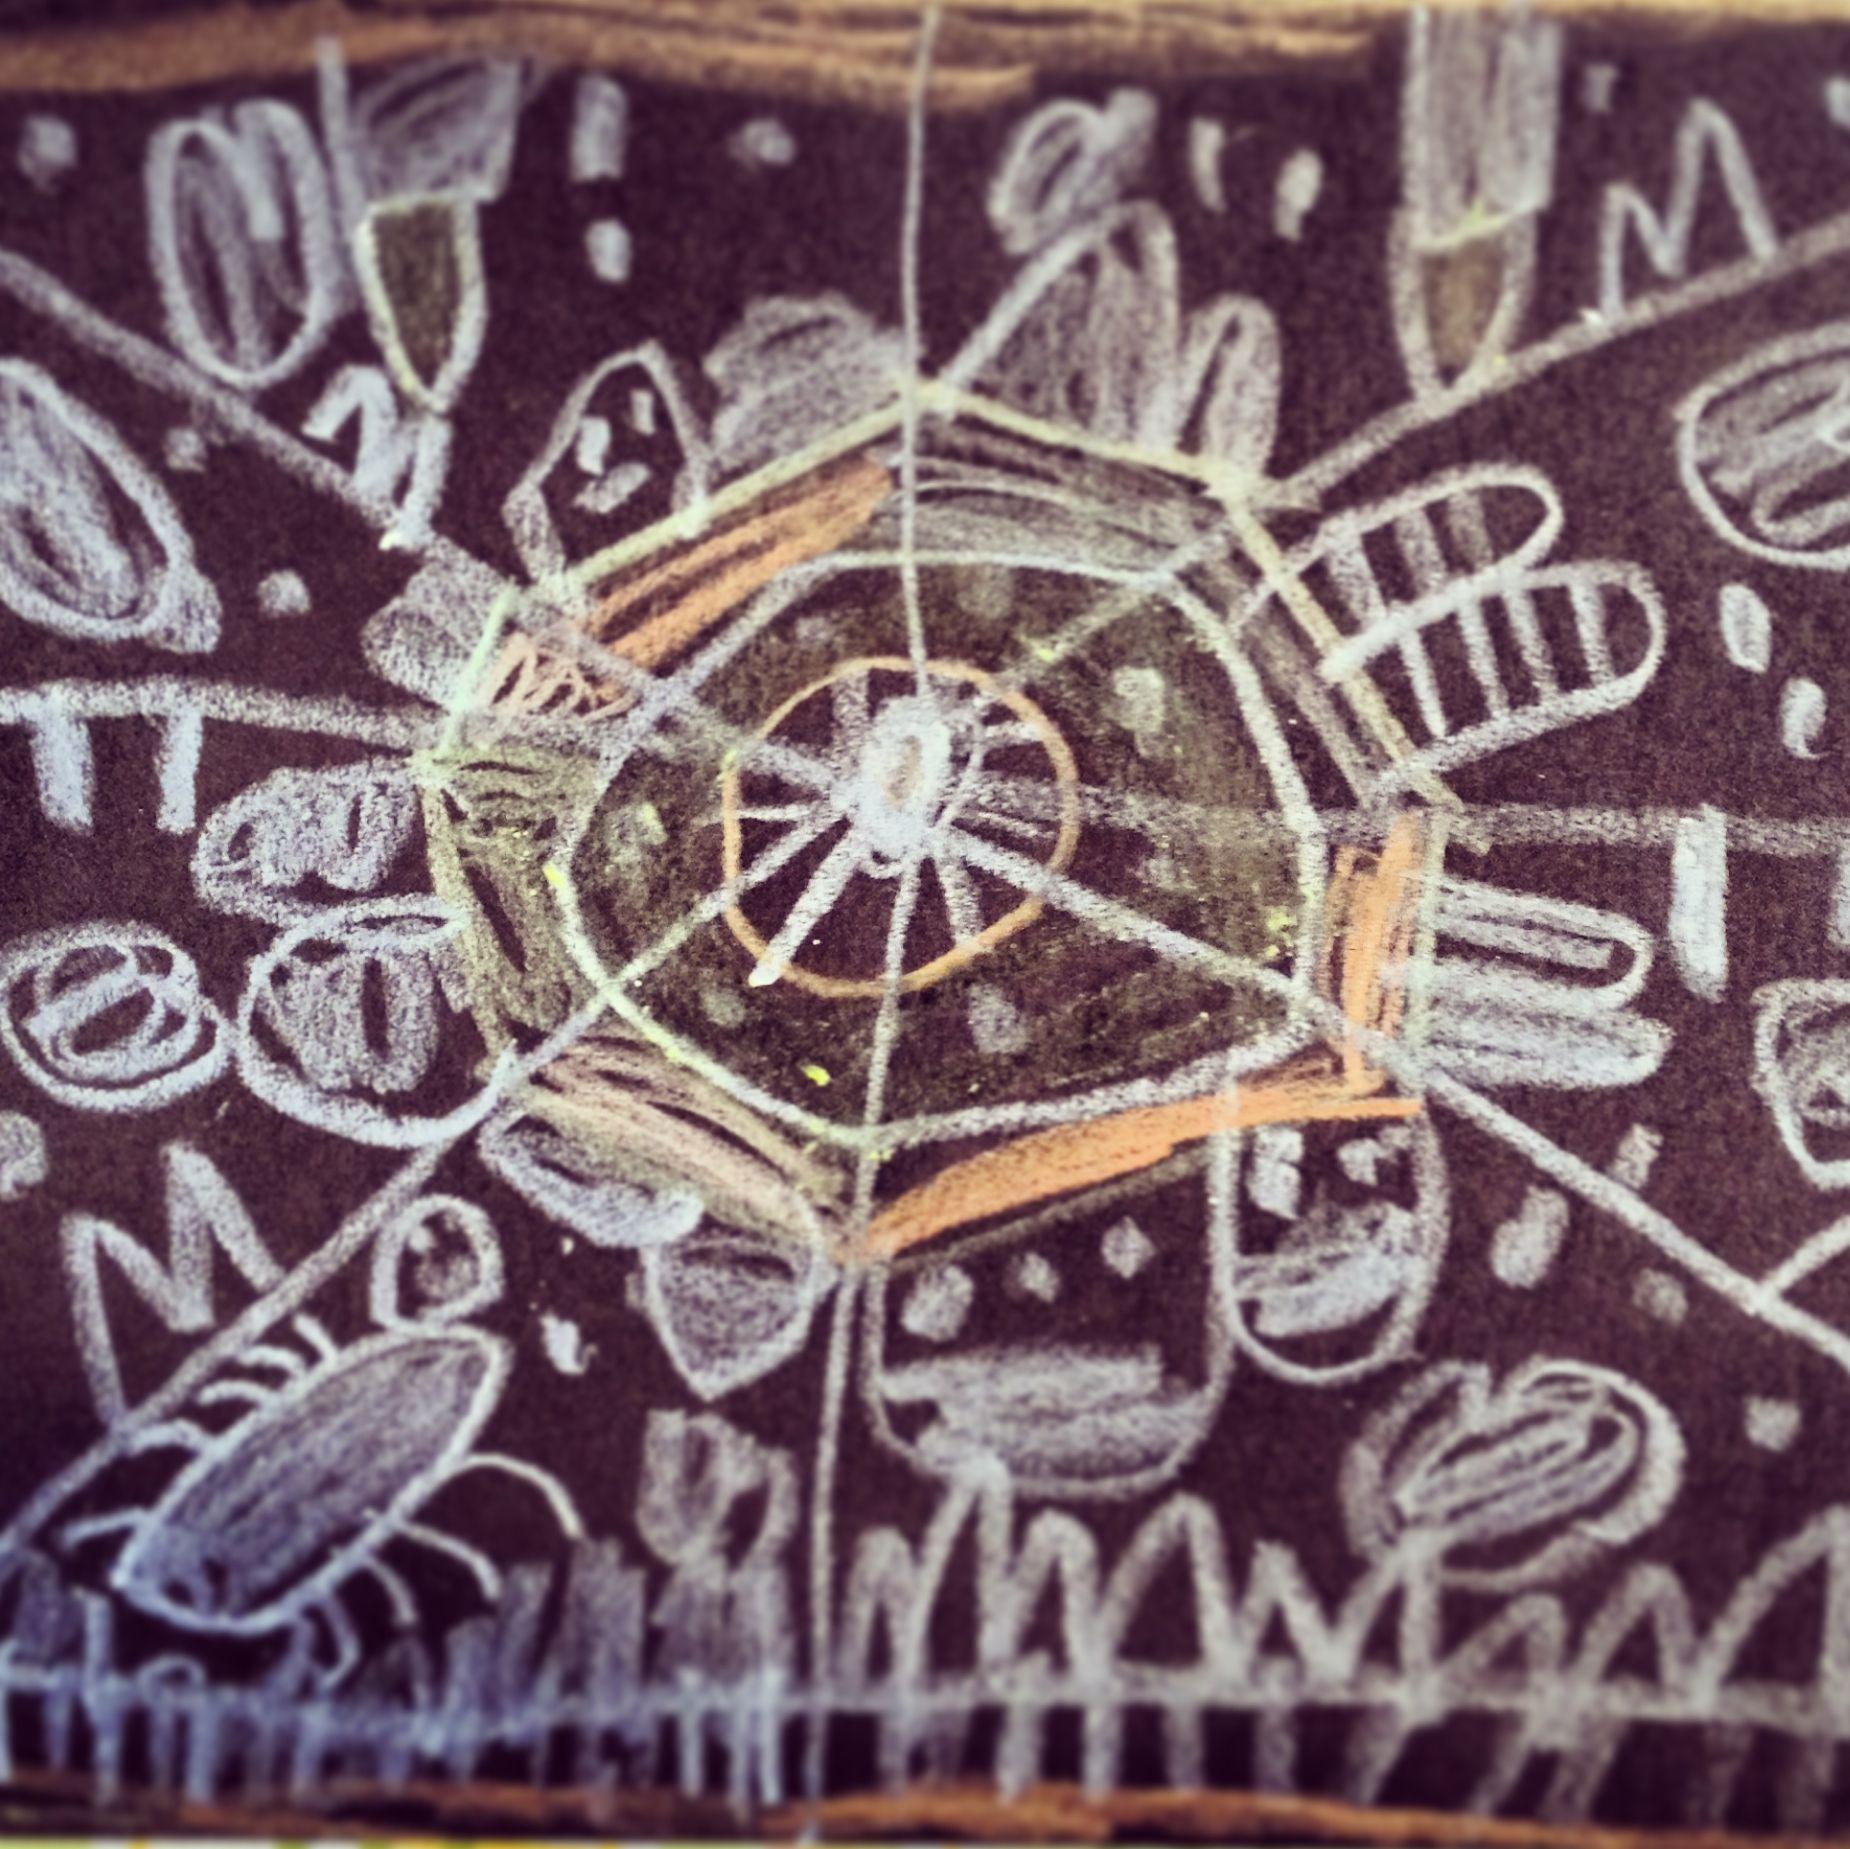 Spider Web Mandala In Chalk (4 Years Old), Artree